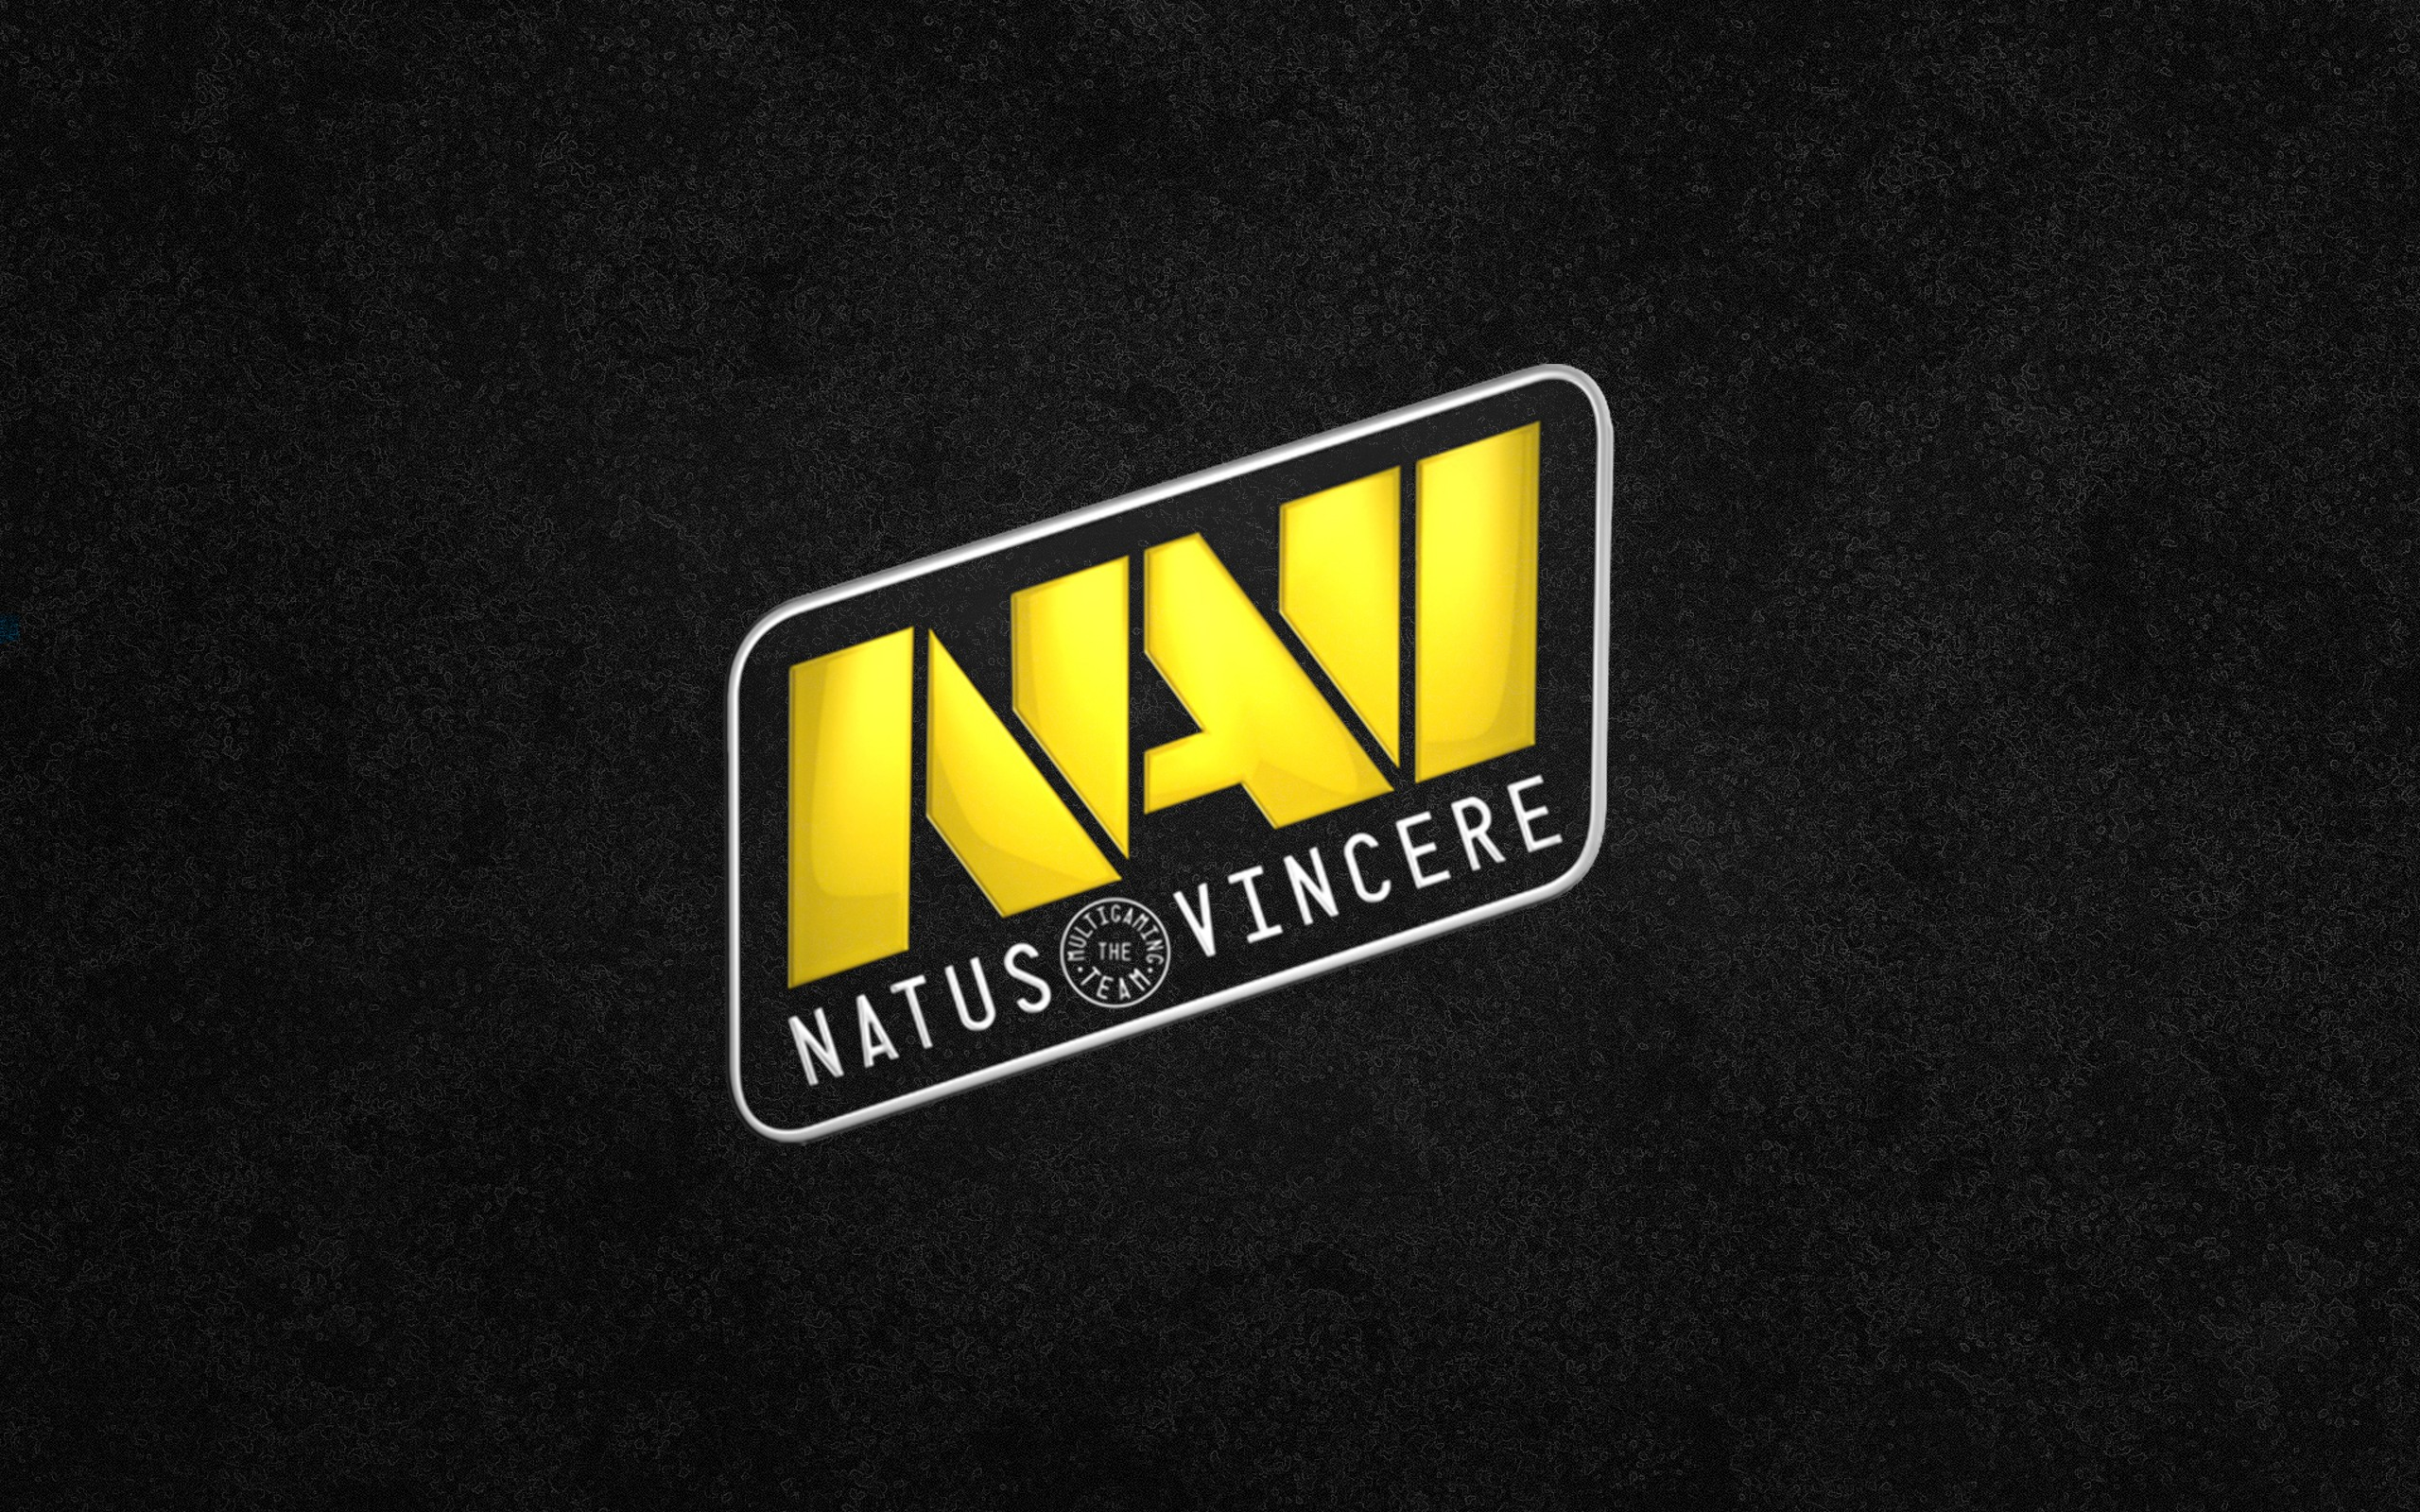 Navi Natus Vincere dota2 wallpaper | 2560x1600 | 190406 | WallpaperUP